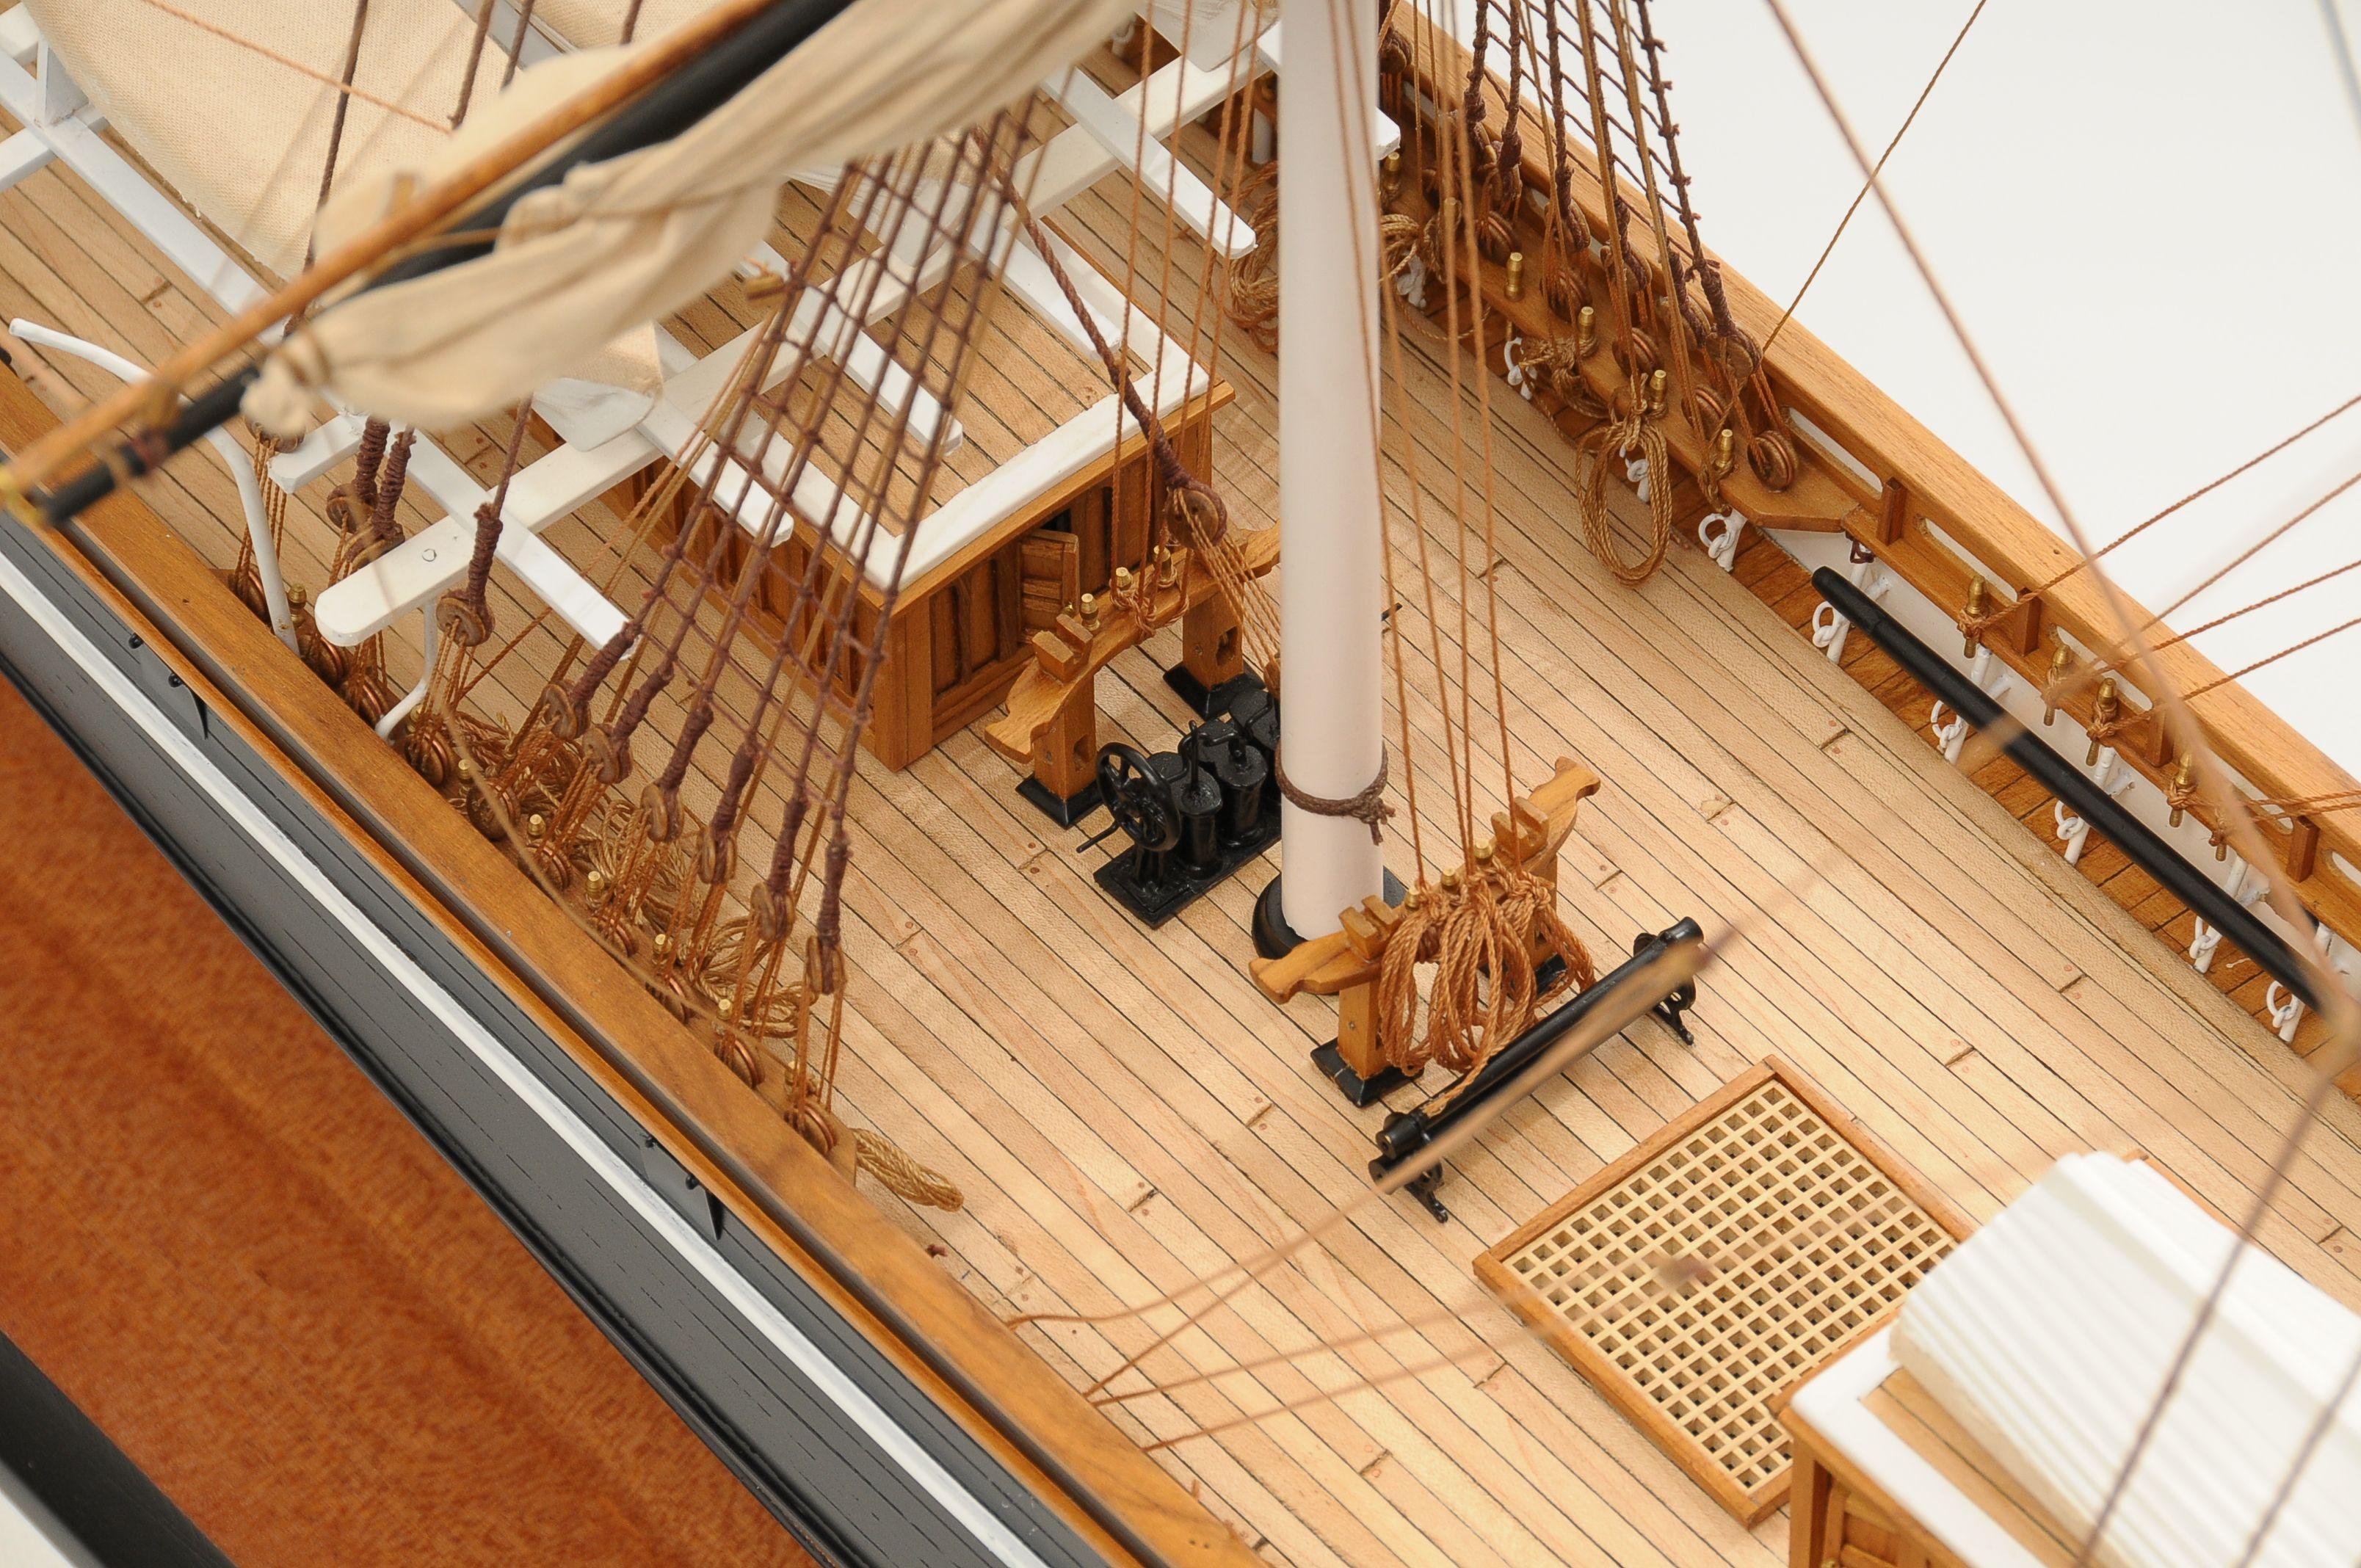 553-8669-Cutty-Sark-model-ship-Premier-Range